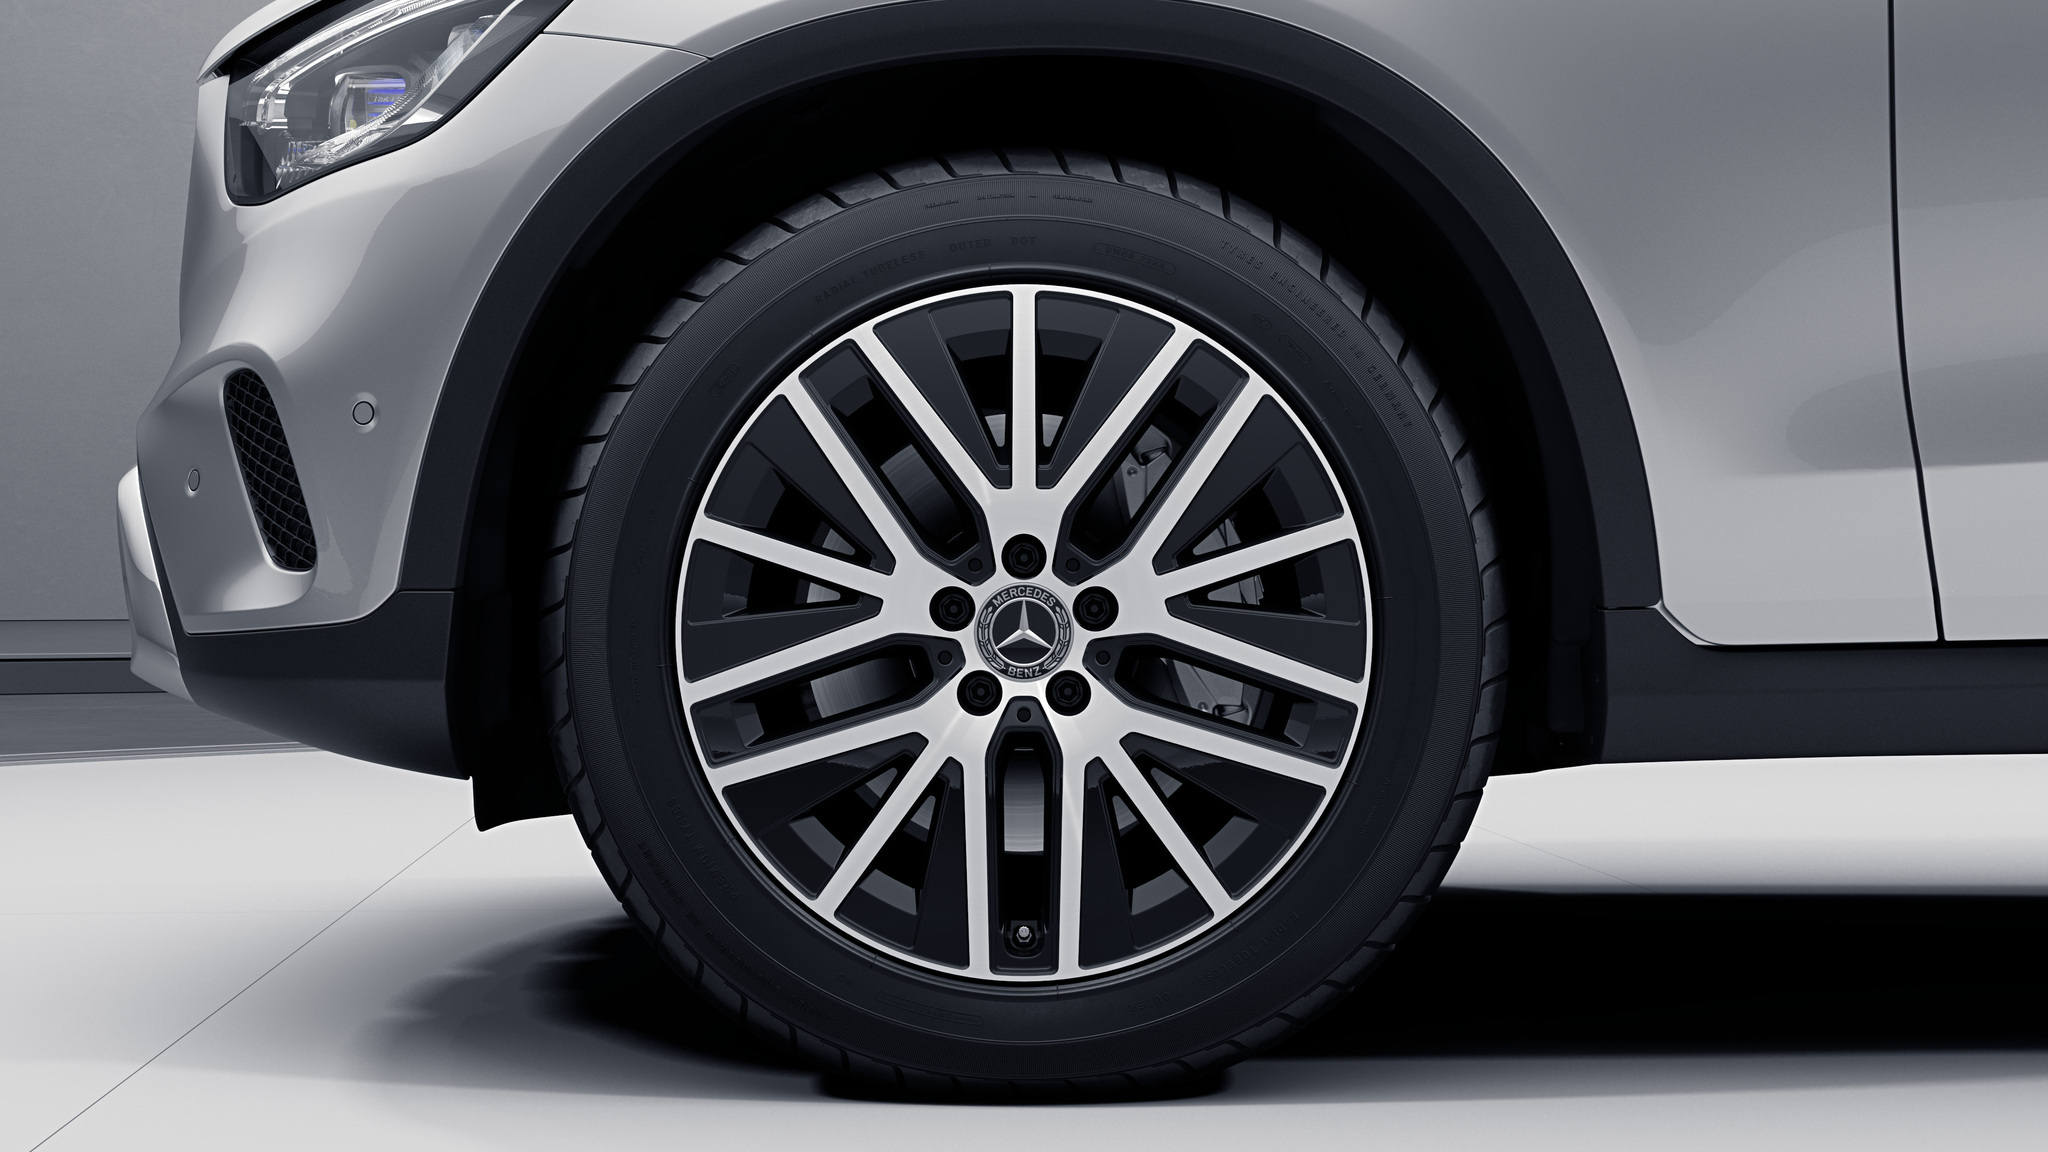 Jantes de la Mercedes-Benz GLC Finition 4 Matic Avantgarde